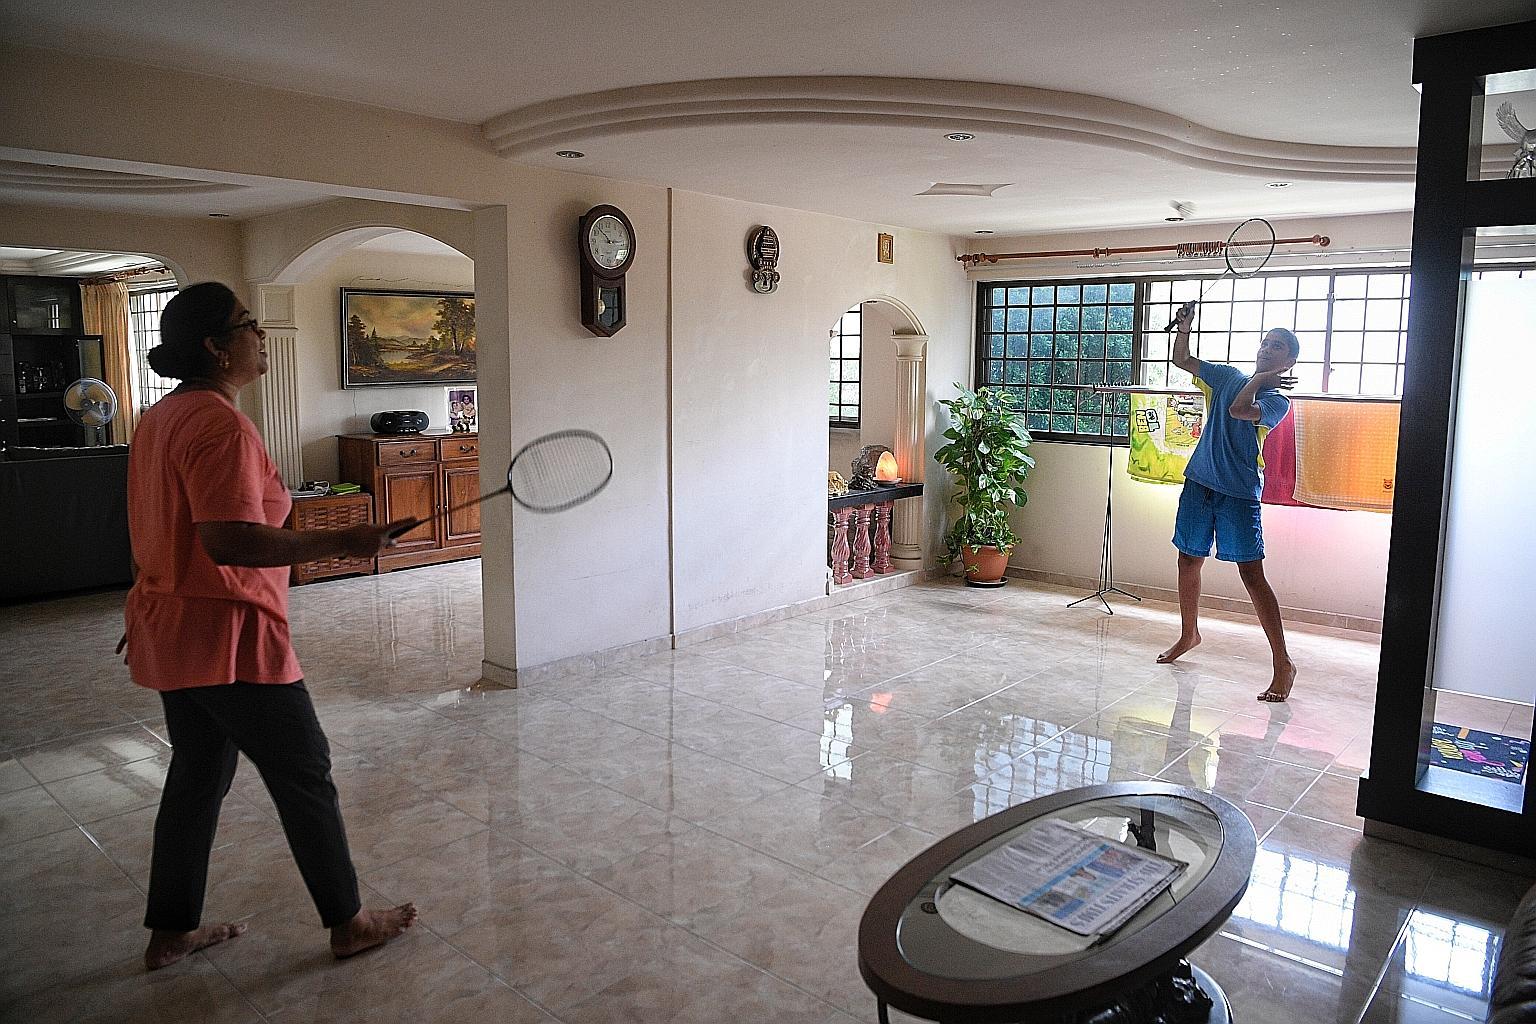 A family playin badminton in their jumbo flat